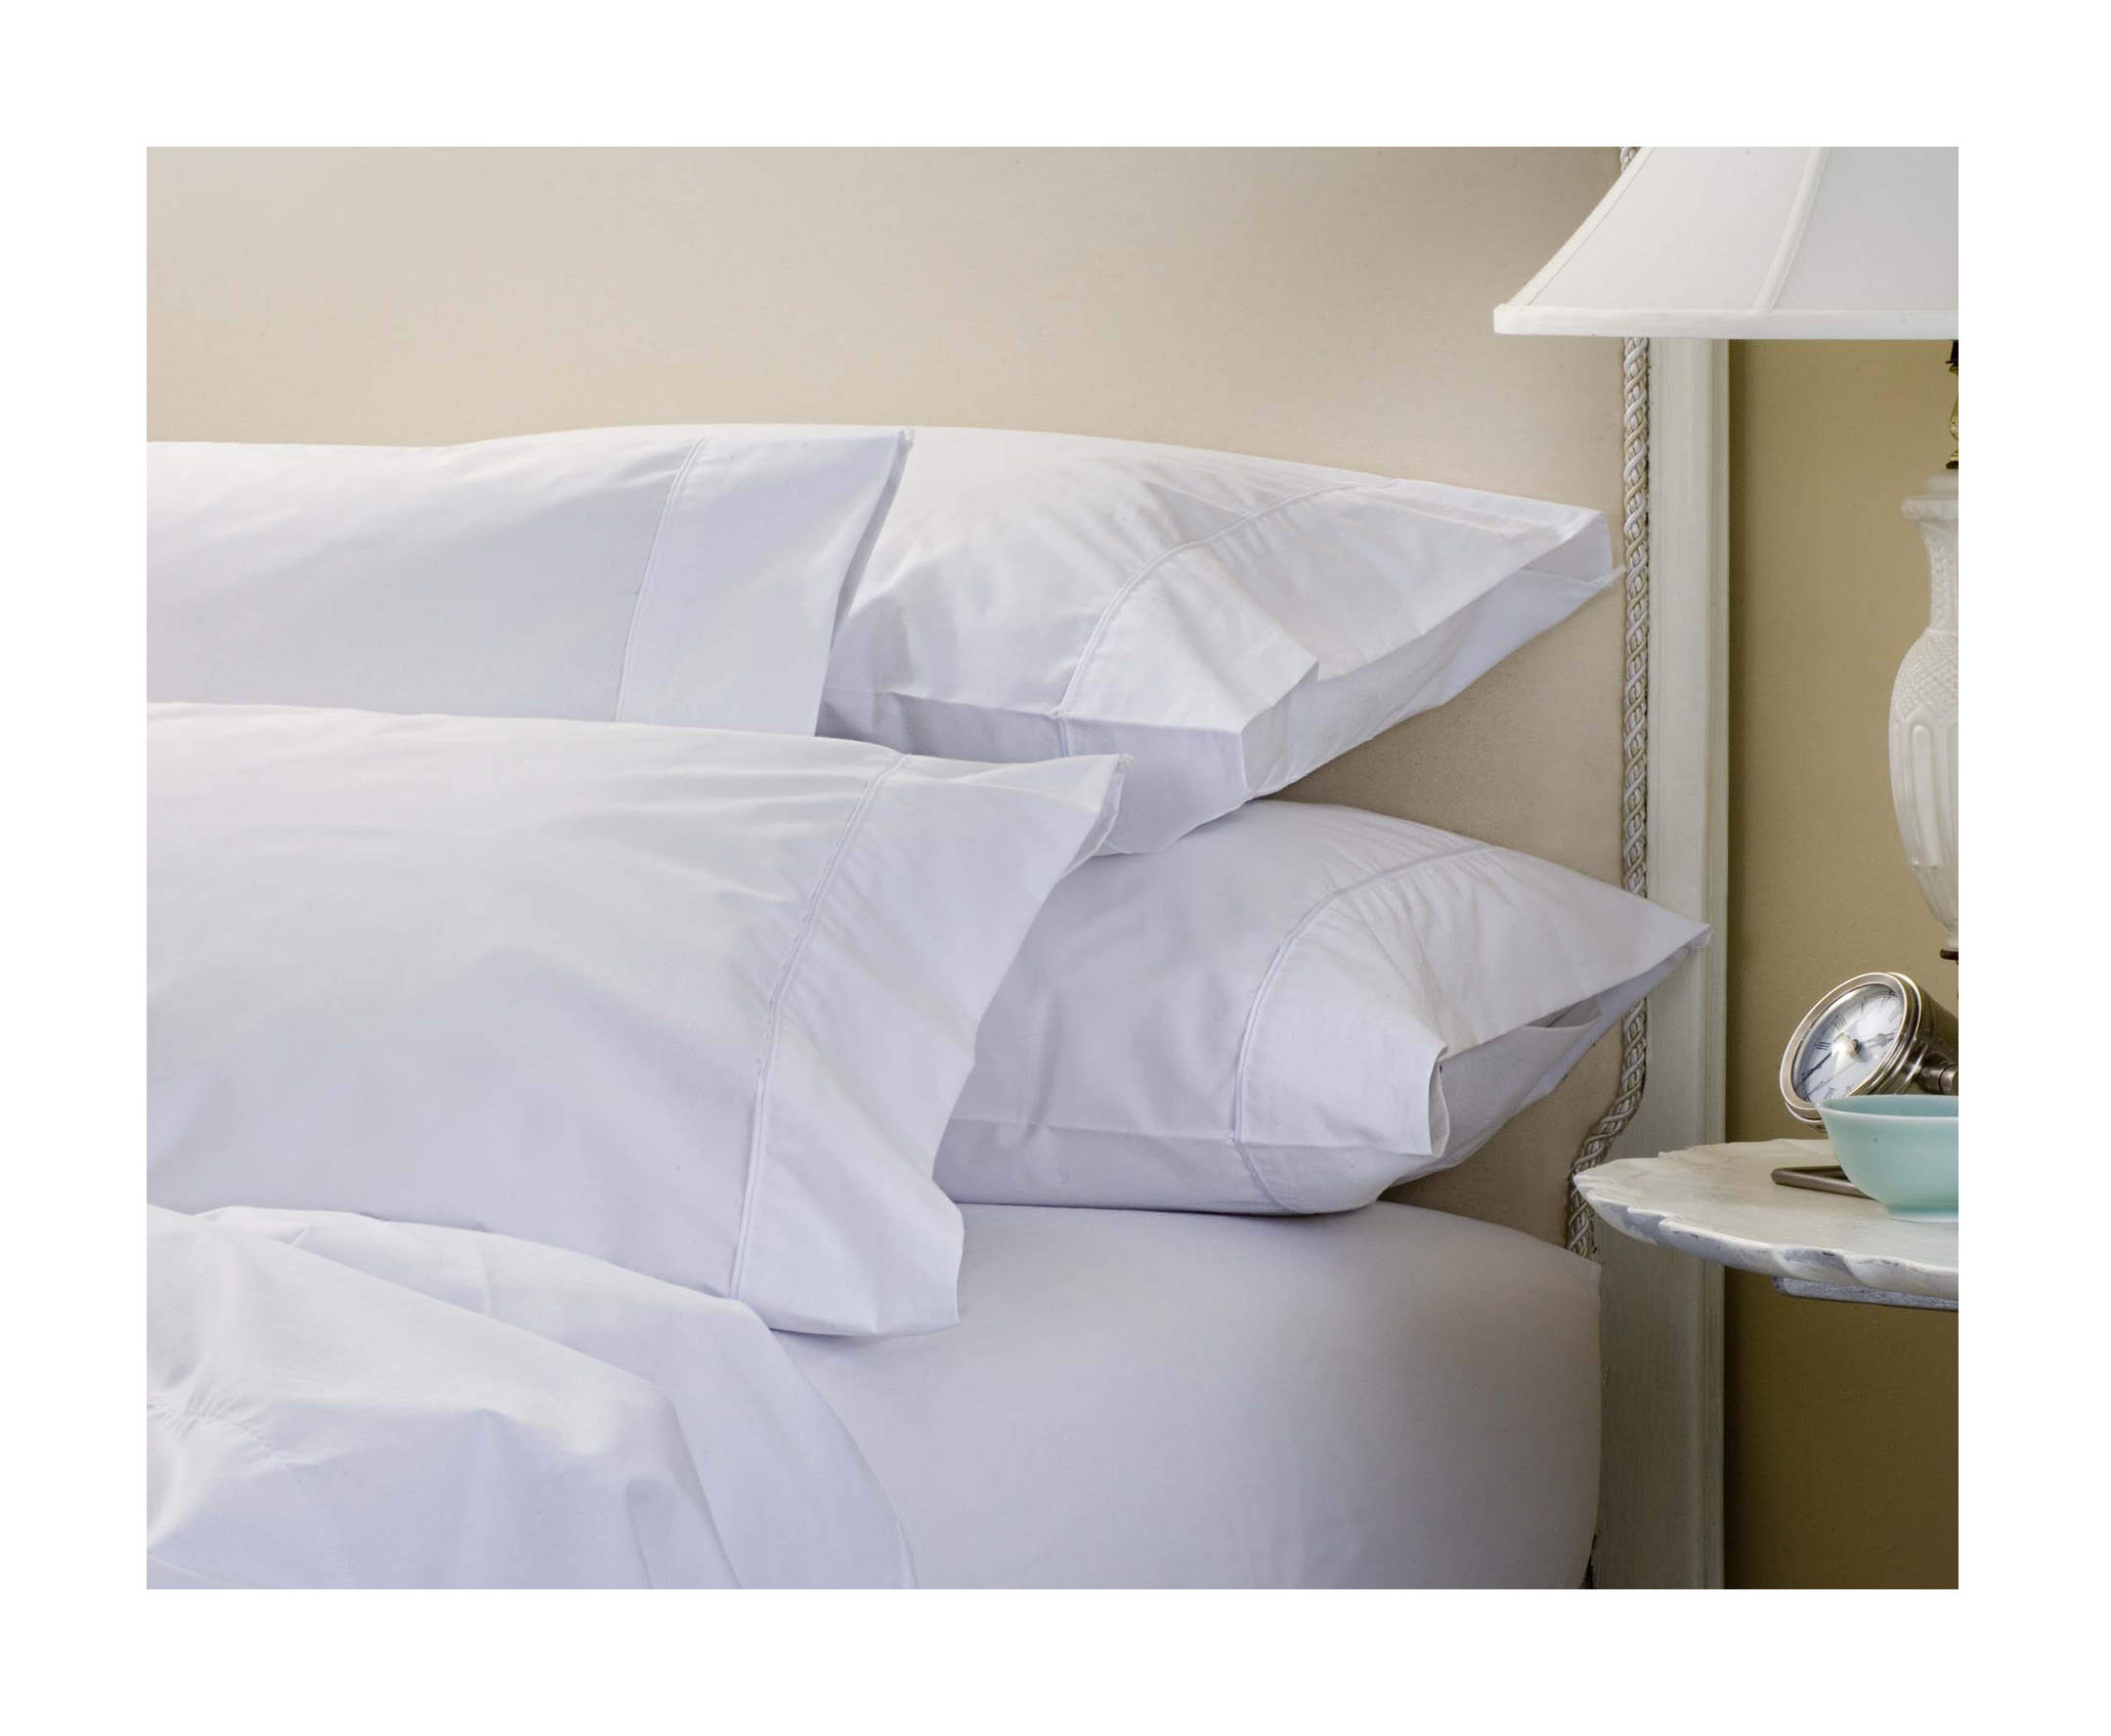 Hotel sheets